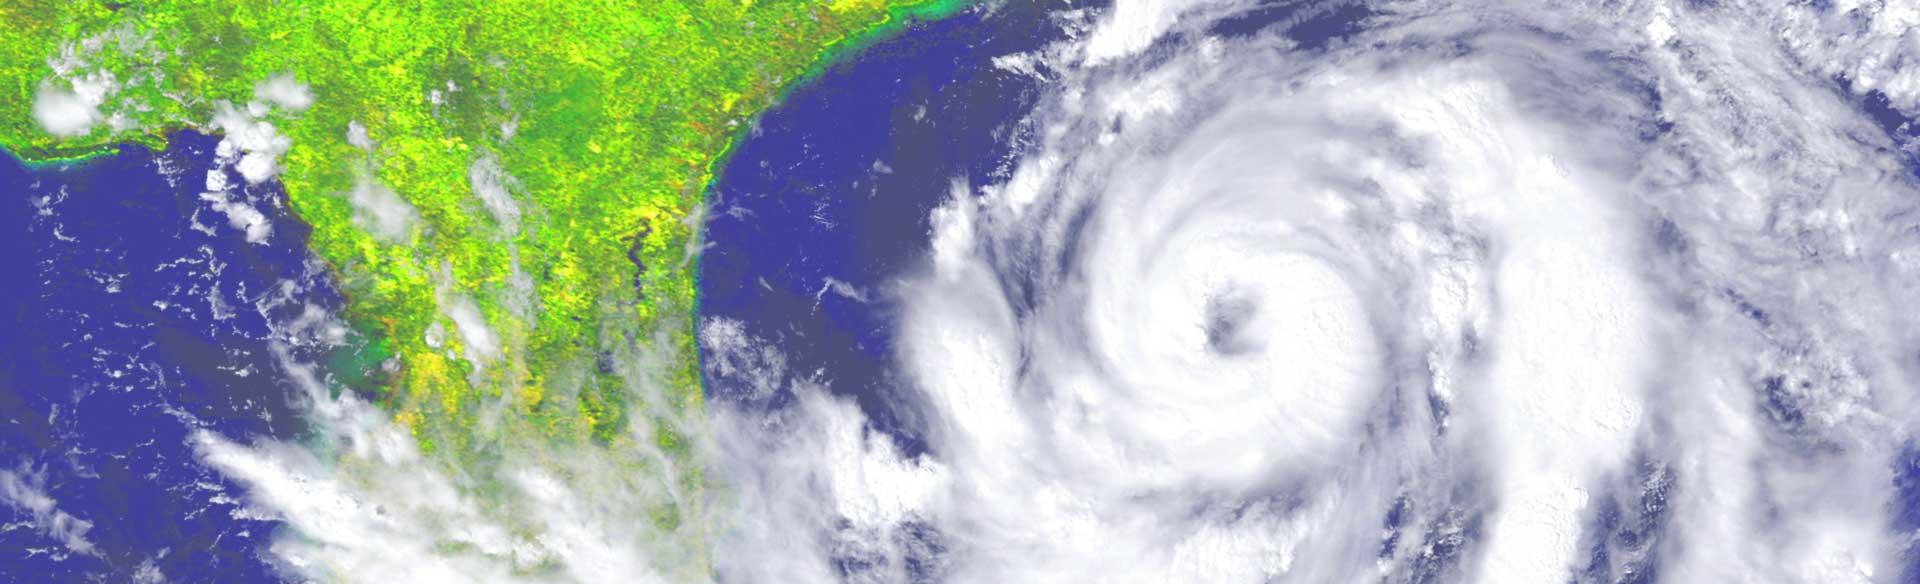 Risk management and vulnerabilities during hurricane season